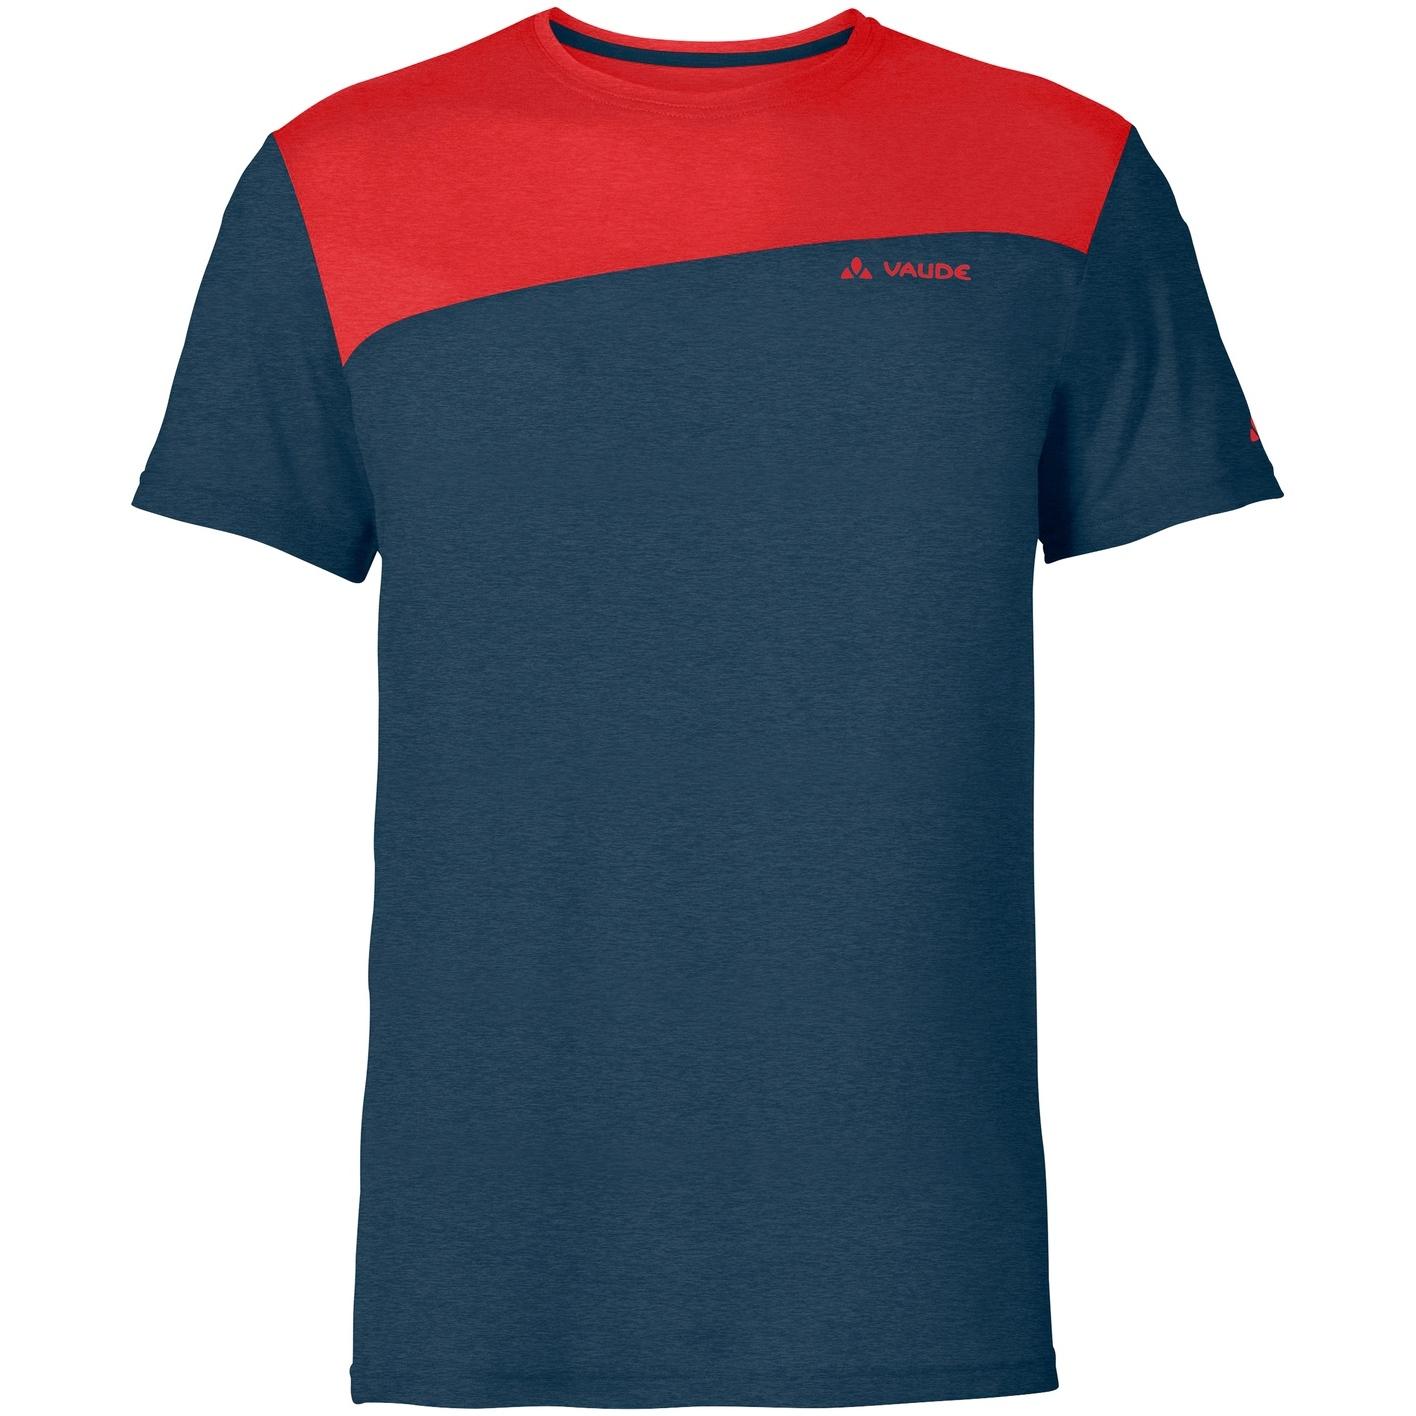 Vaude Sveit T-Shirt - mars red